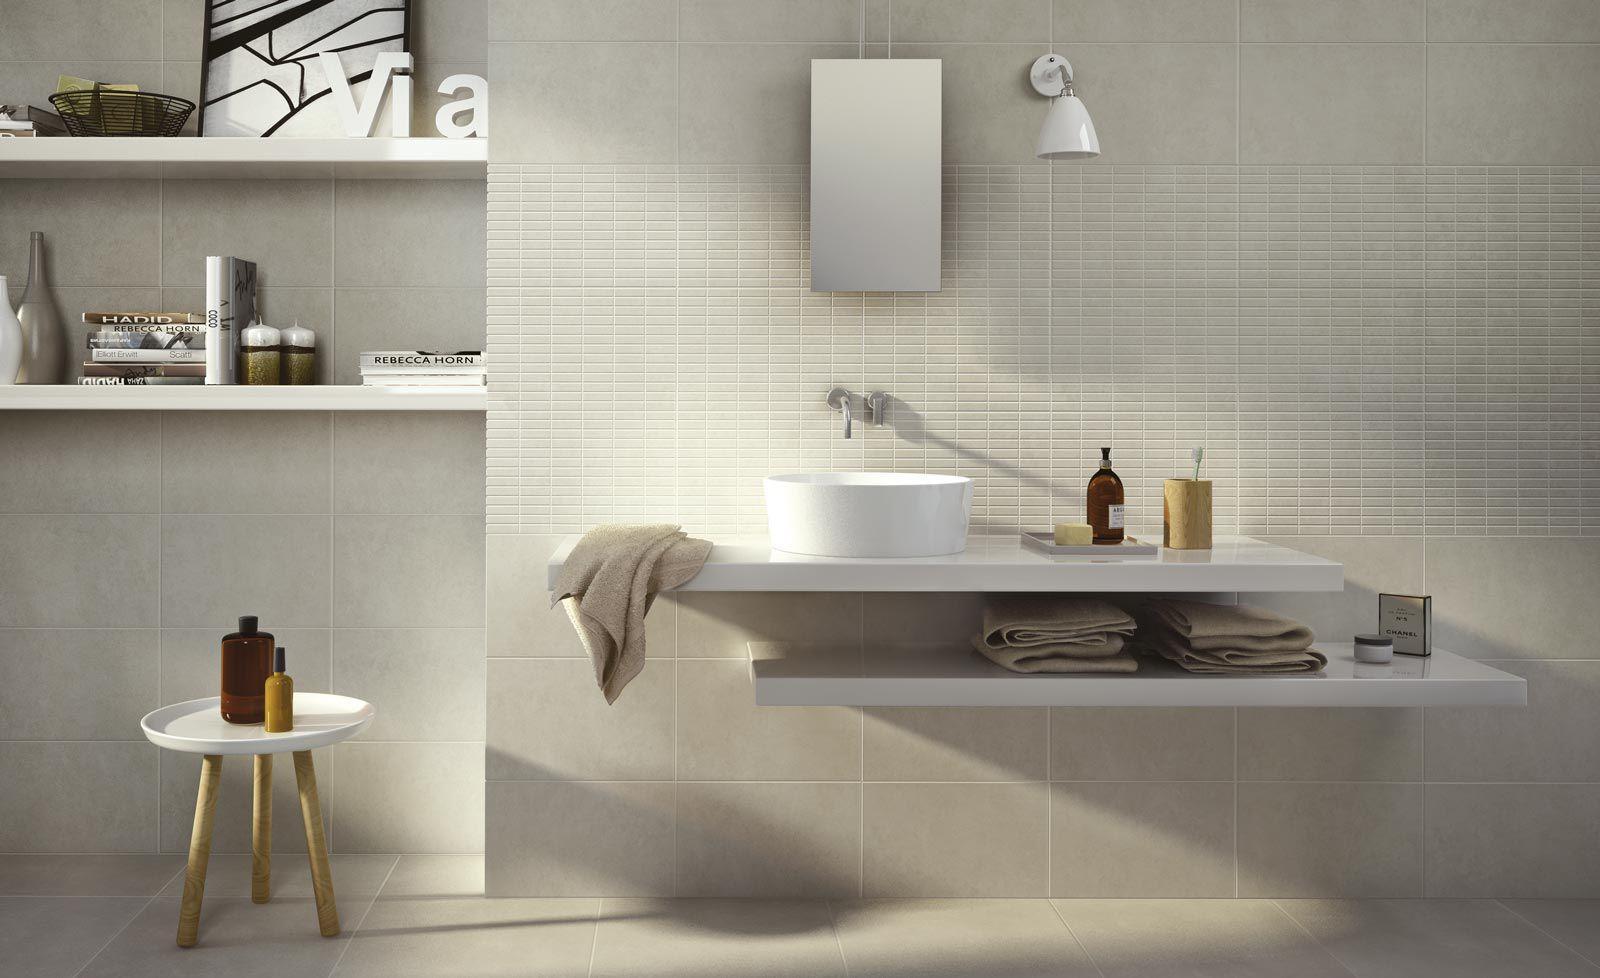 Carrelage de salle de bain / de cuisine / mural / en céramique ...